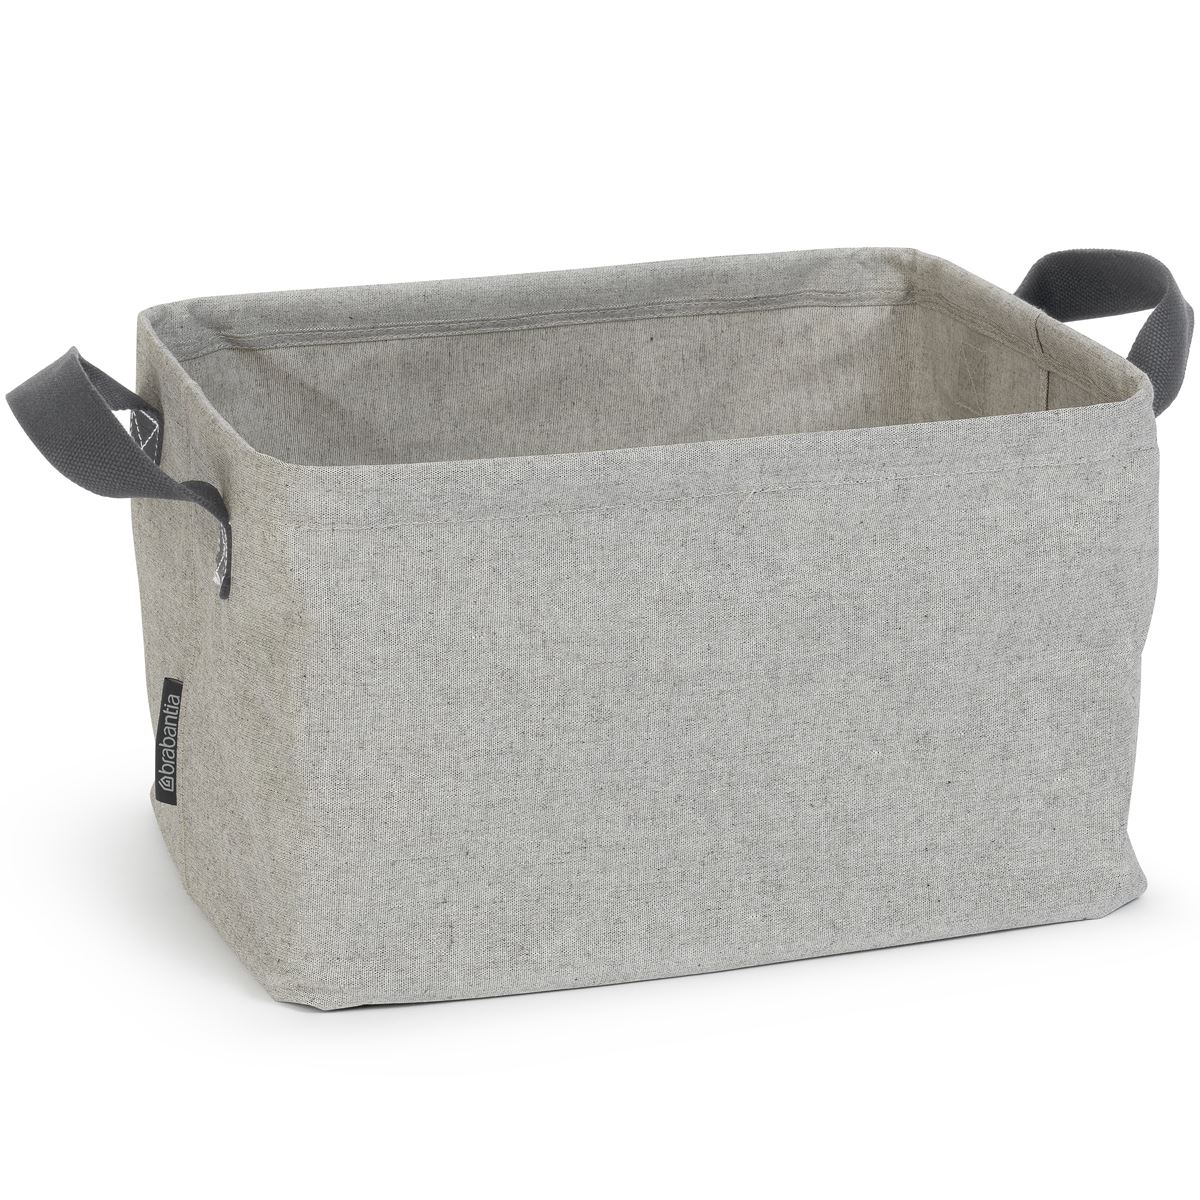 Brabantia Foldable Laundry Basket 35L